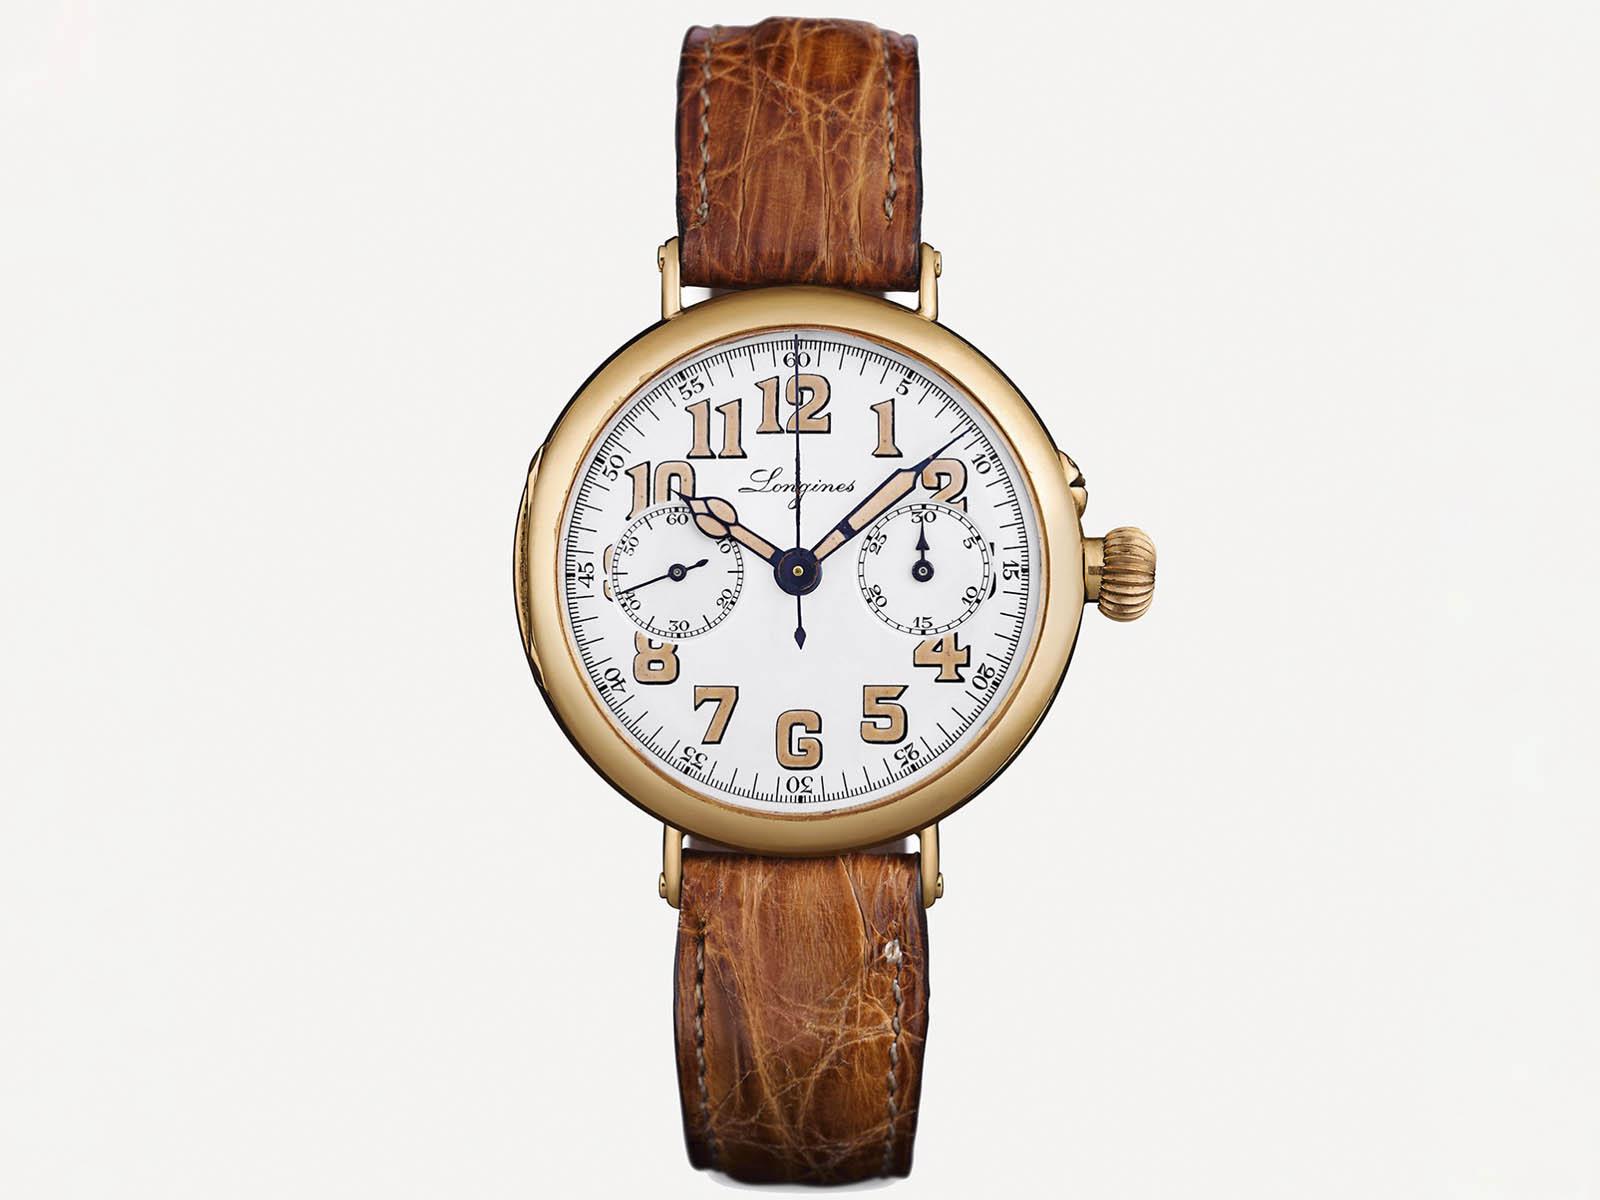 heritage-watches-12.jpg